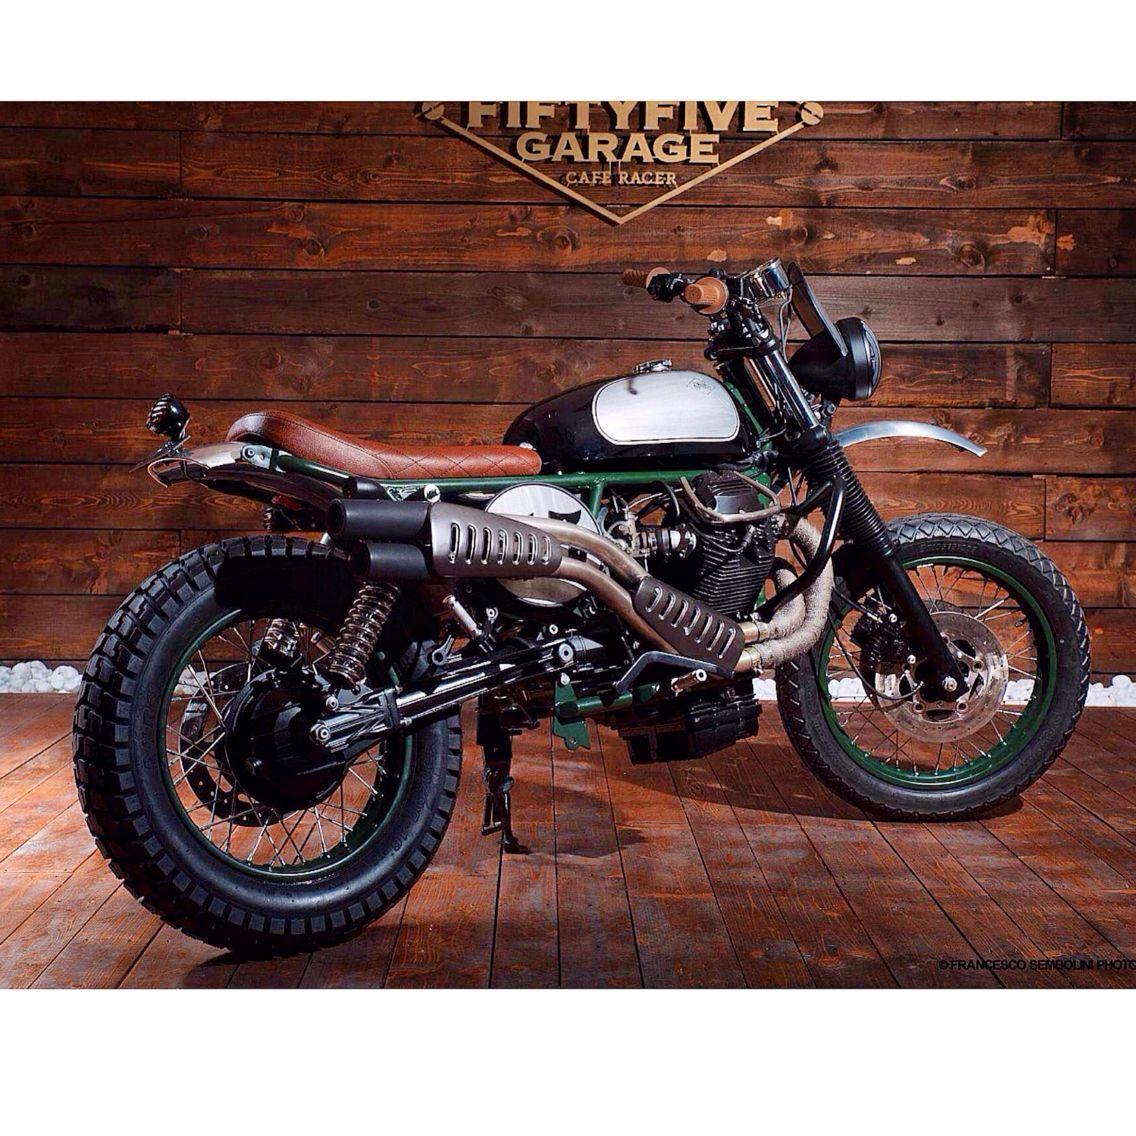 MotoGuzzi TuttoTerreno by FiftyFive Garage, Italy